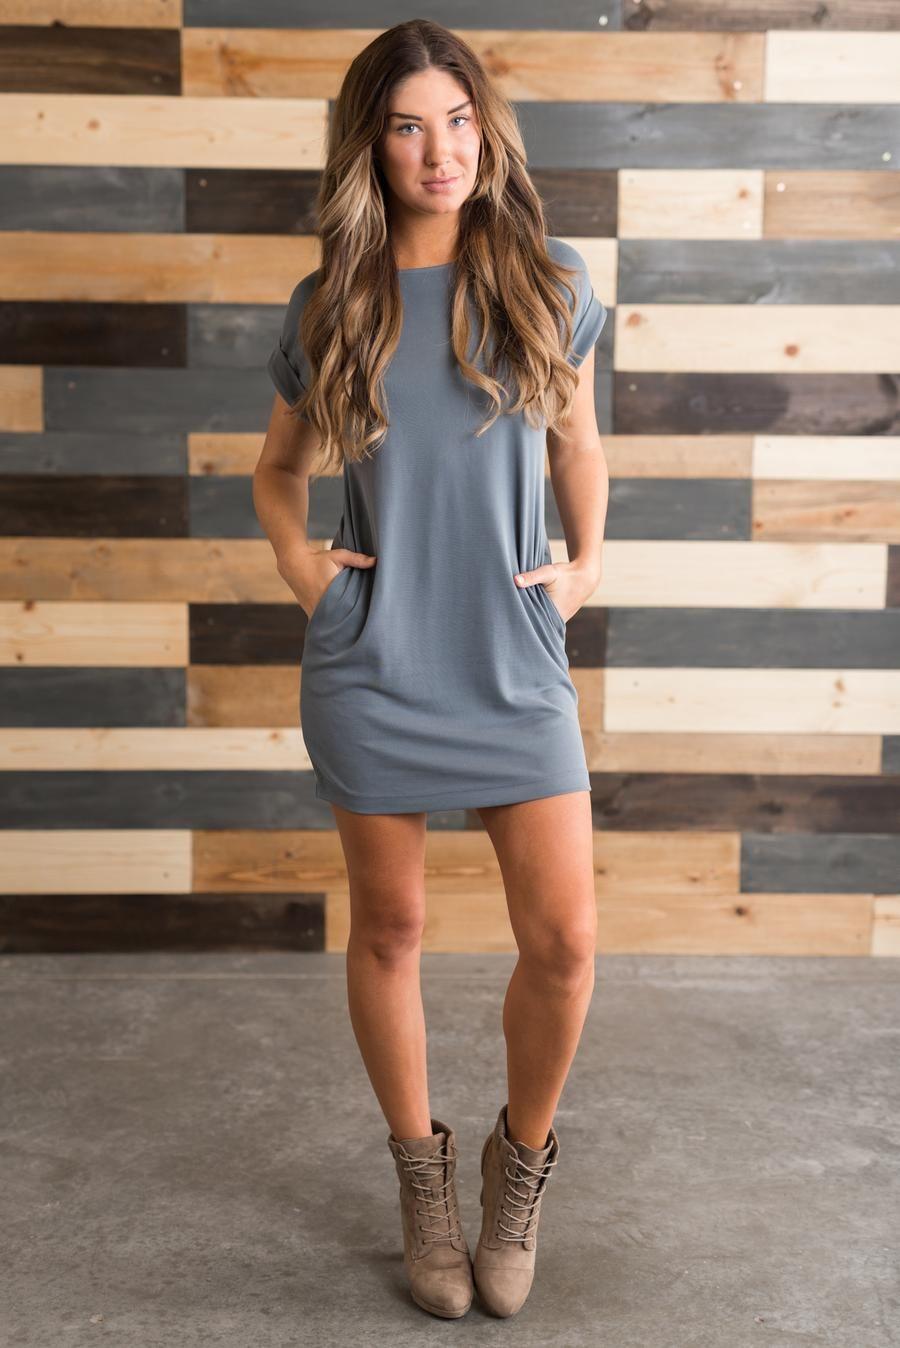 Zane T Shirt Dress Blue Tshirt Dress Outfit Fall Dress Outfit Fashion [ 1348 x 900 Pixel ]